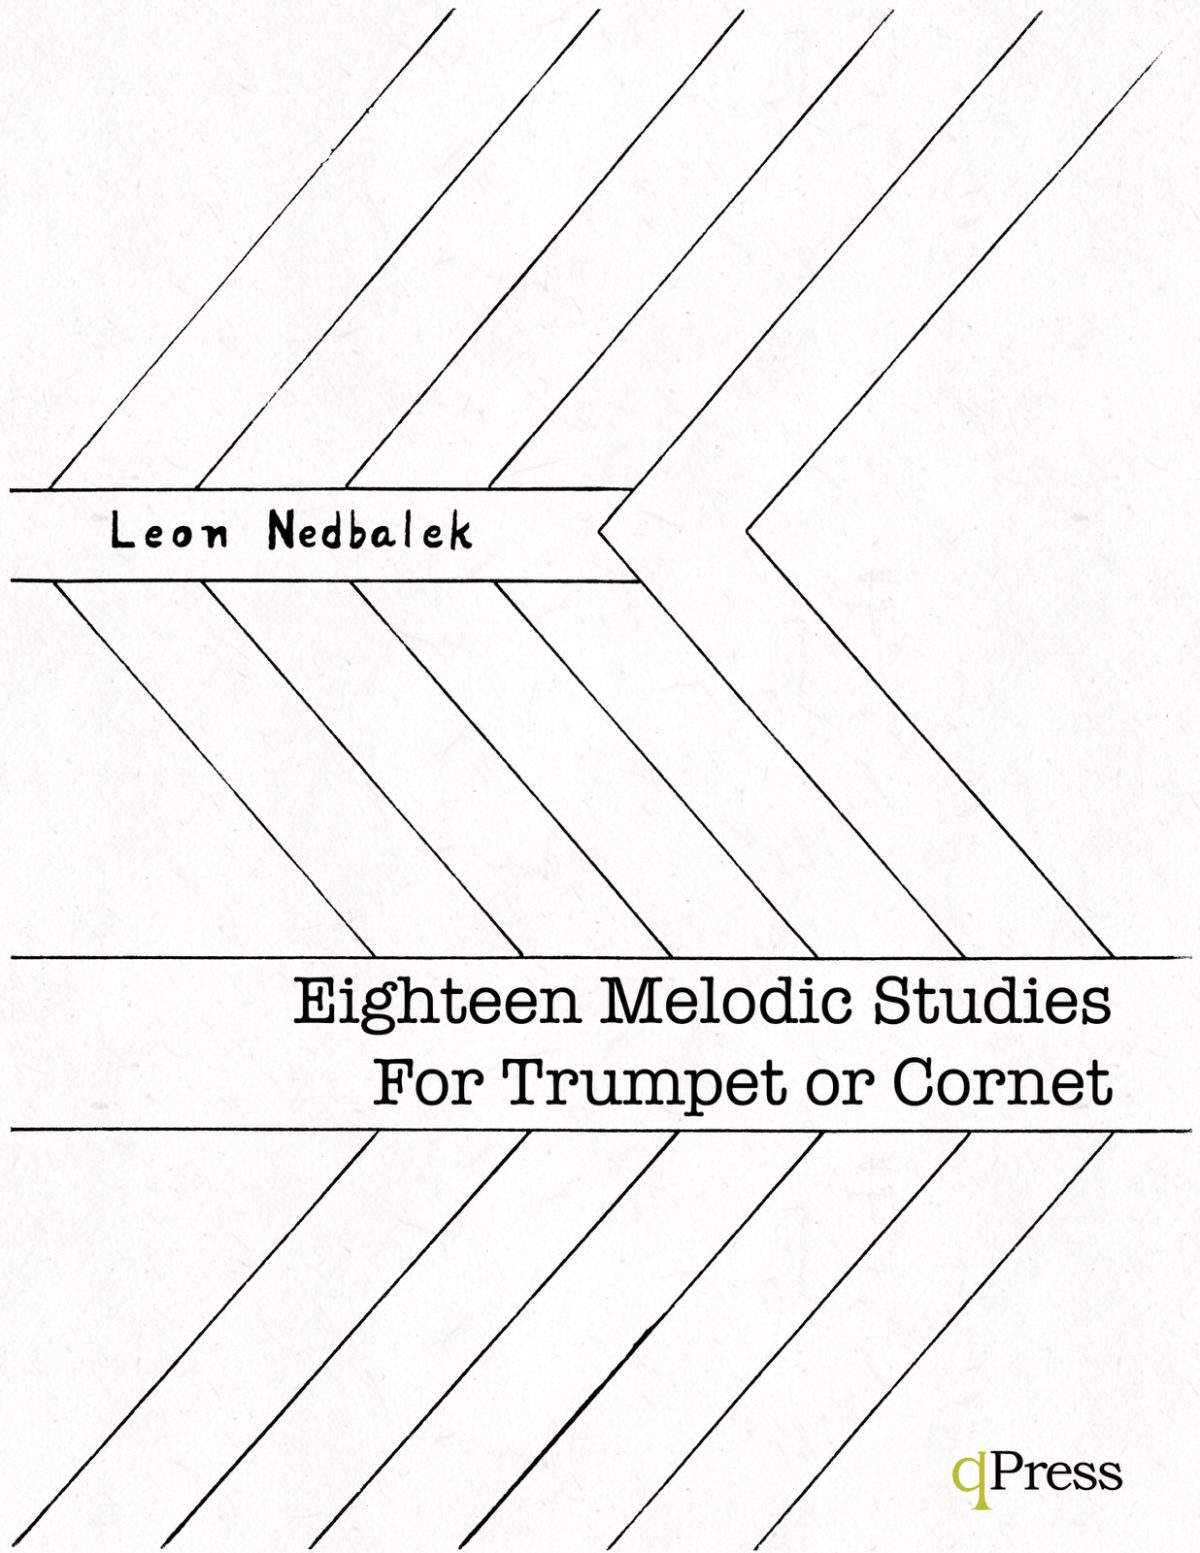 Nedbalek, Leon, Eighteen Melodic Studies for Cornet or Trumpet